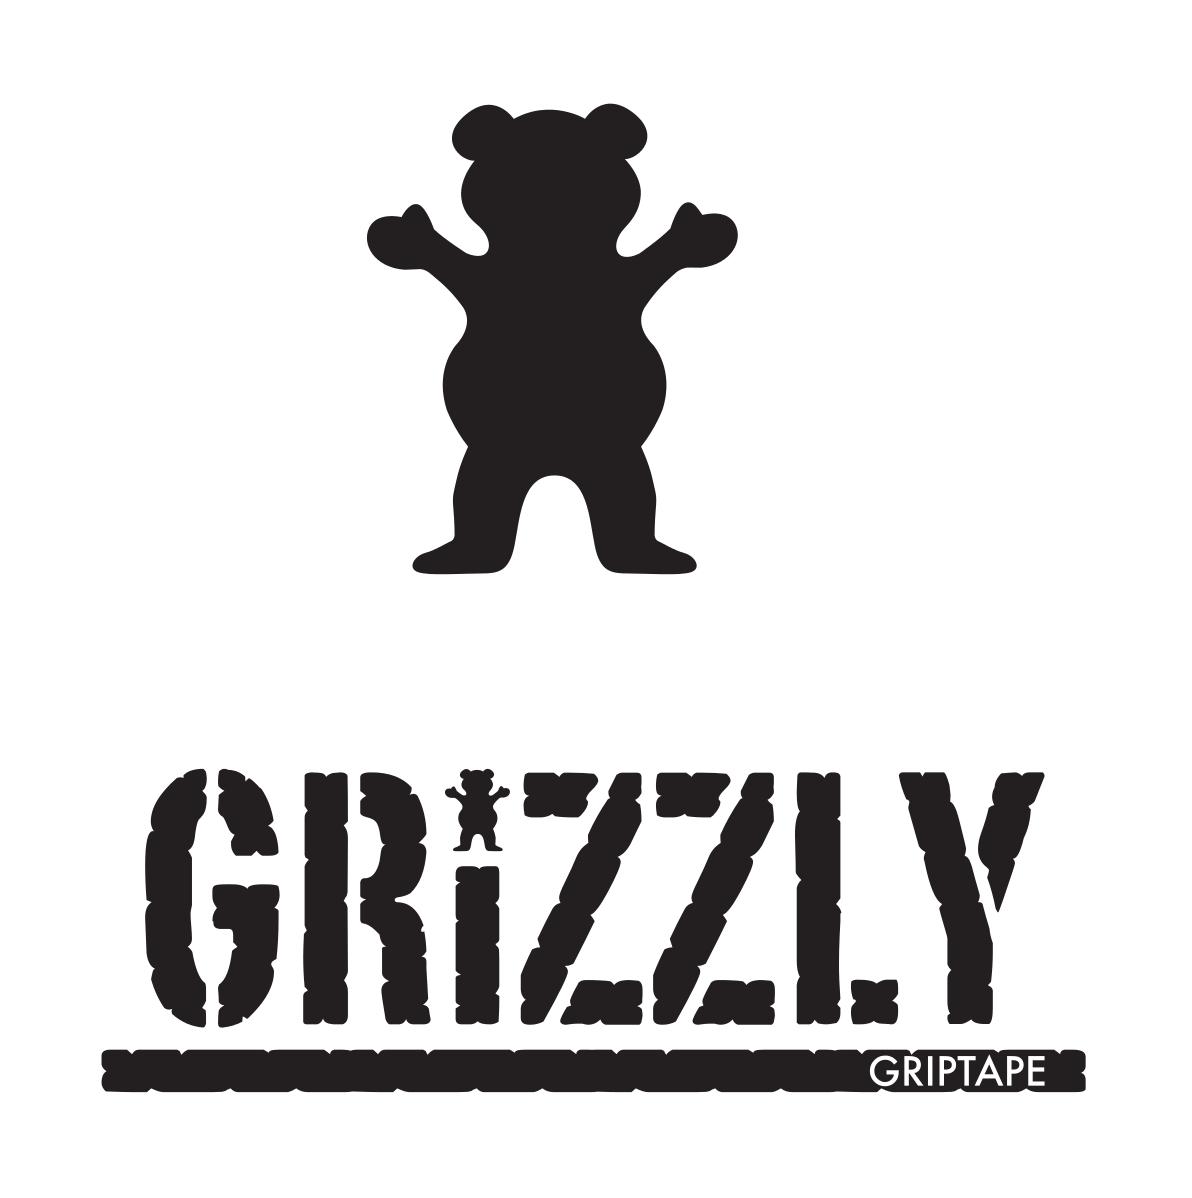 grizzly skate wallpaper - buscar con google | - skate - | pinterest